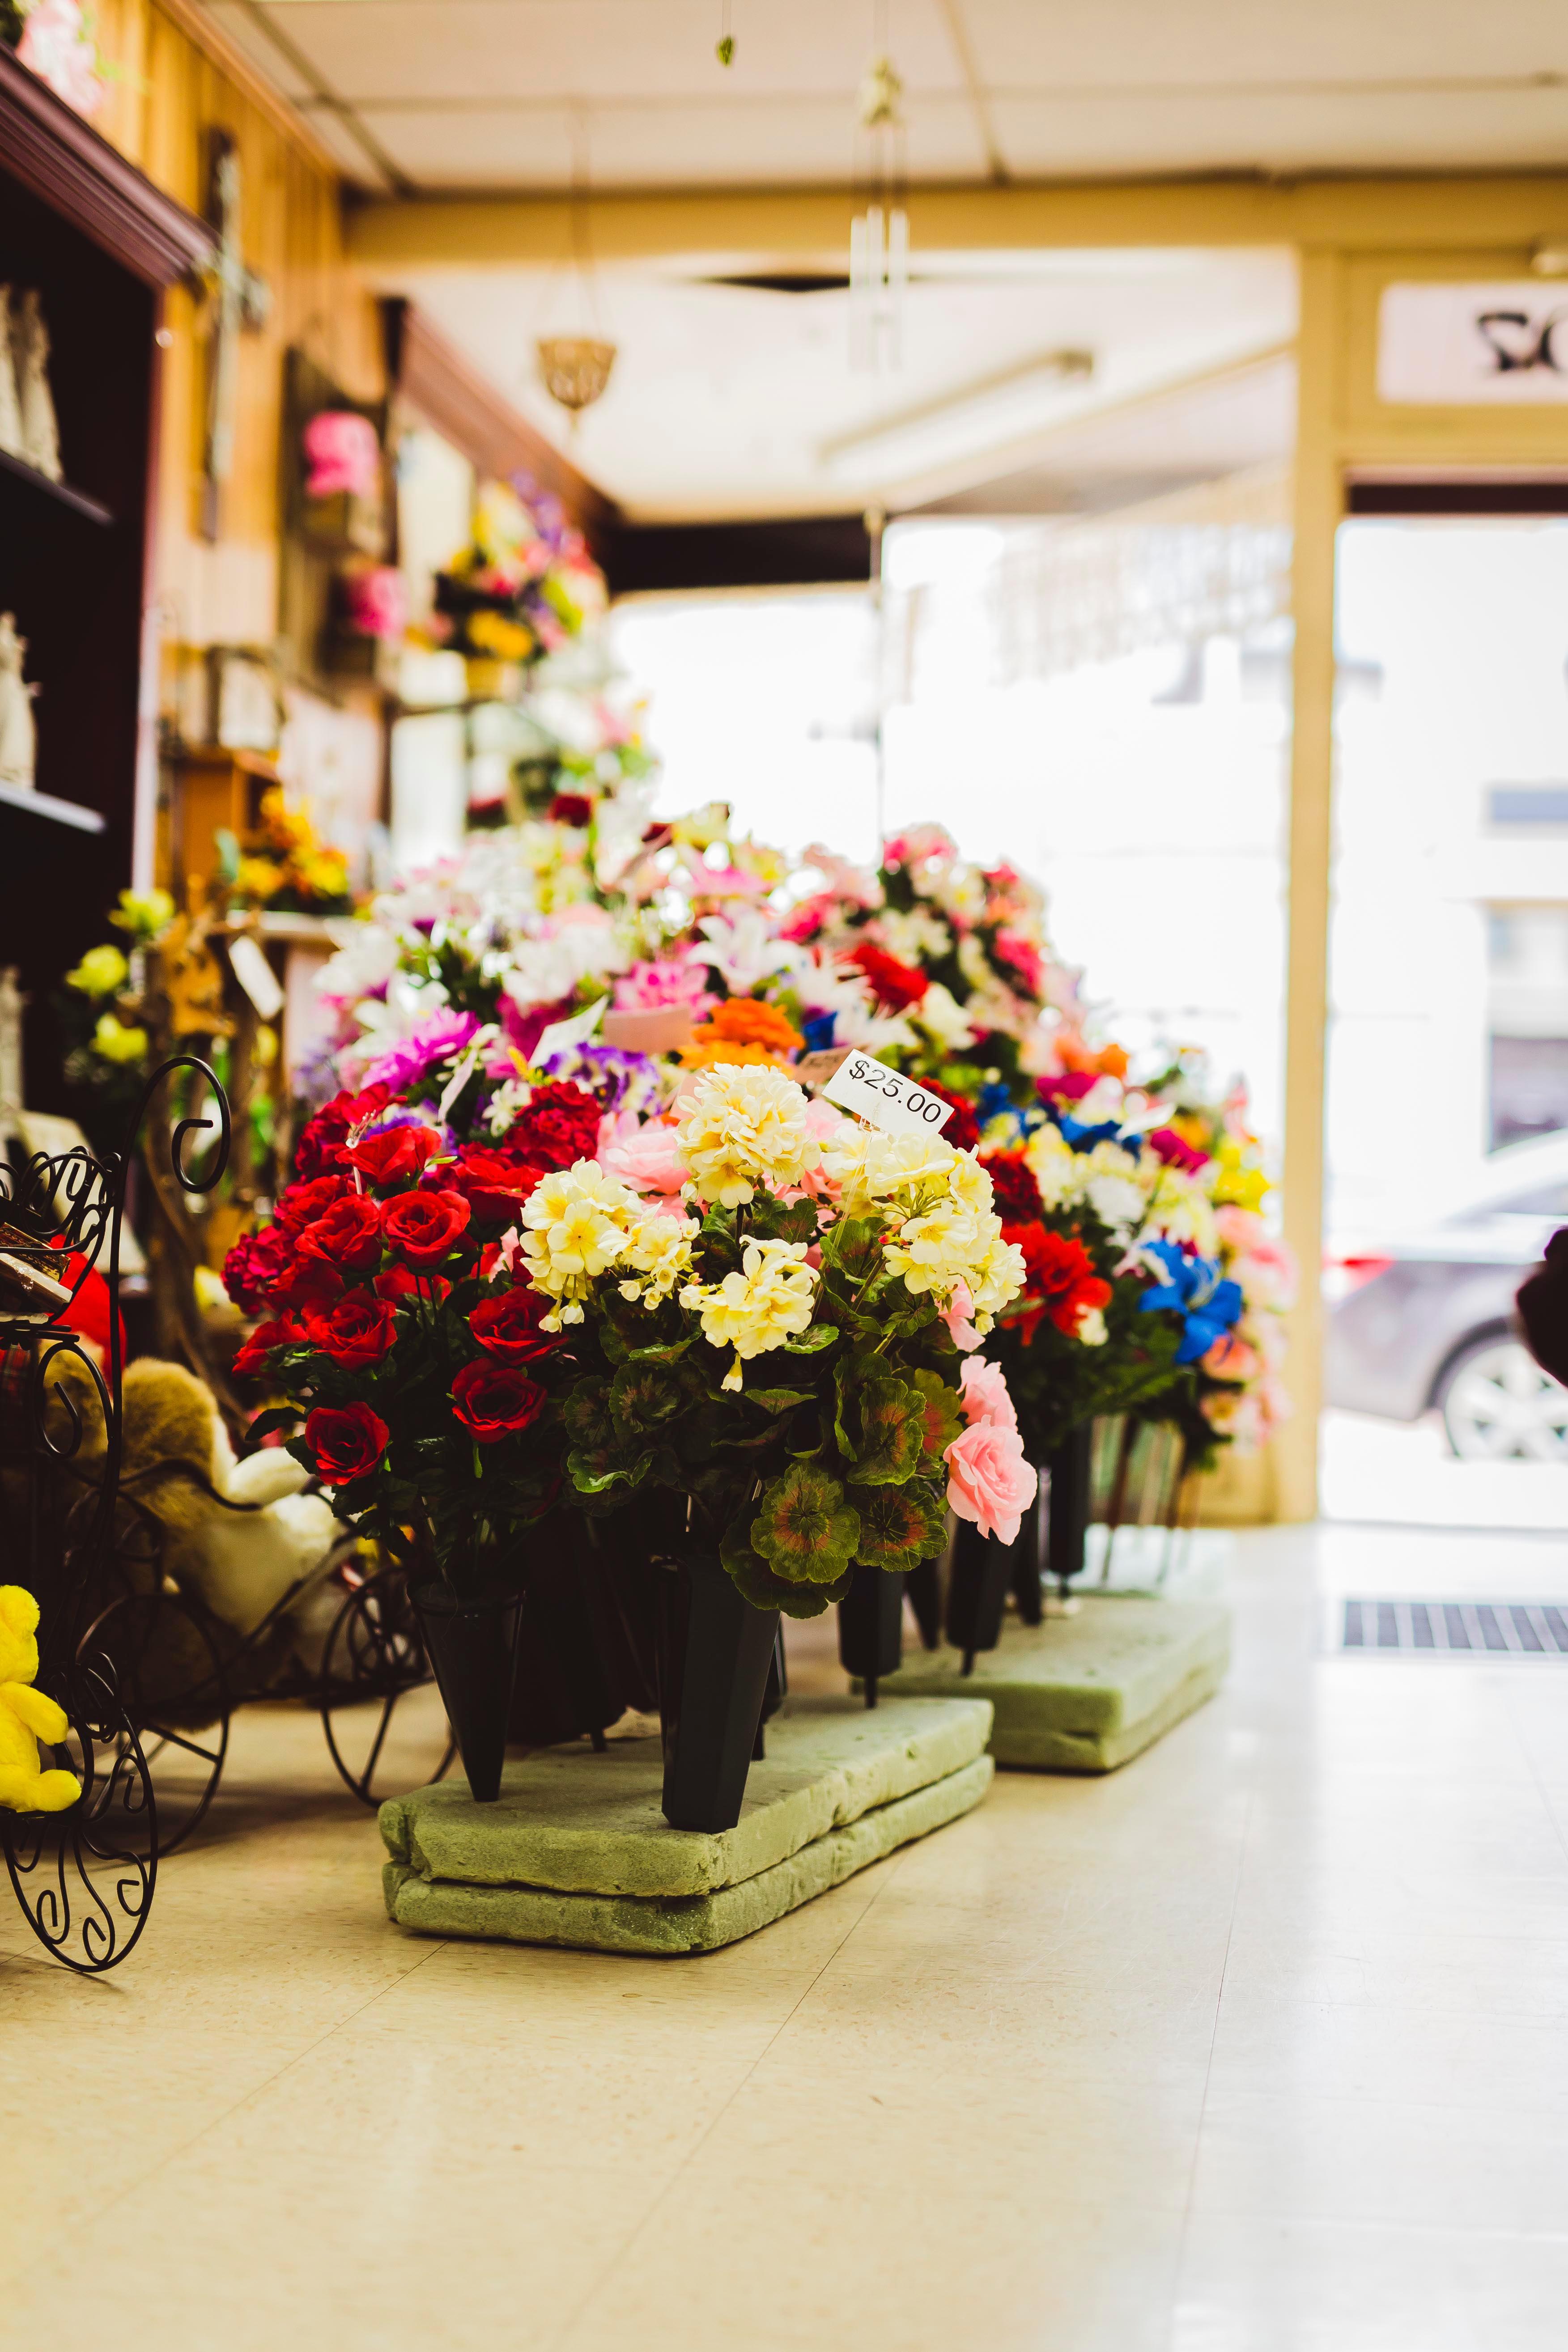 Sid's Flower Shop image 11